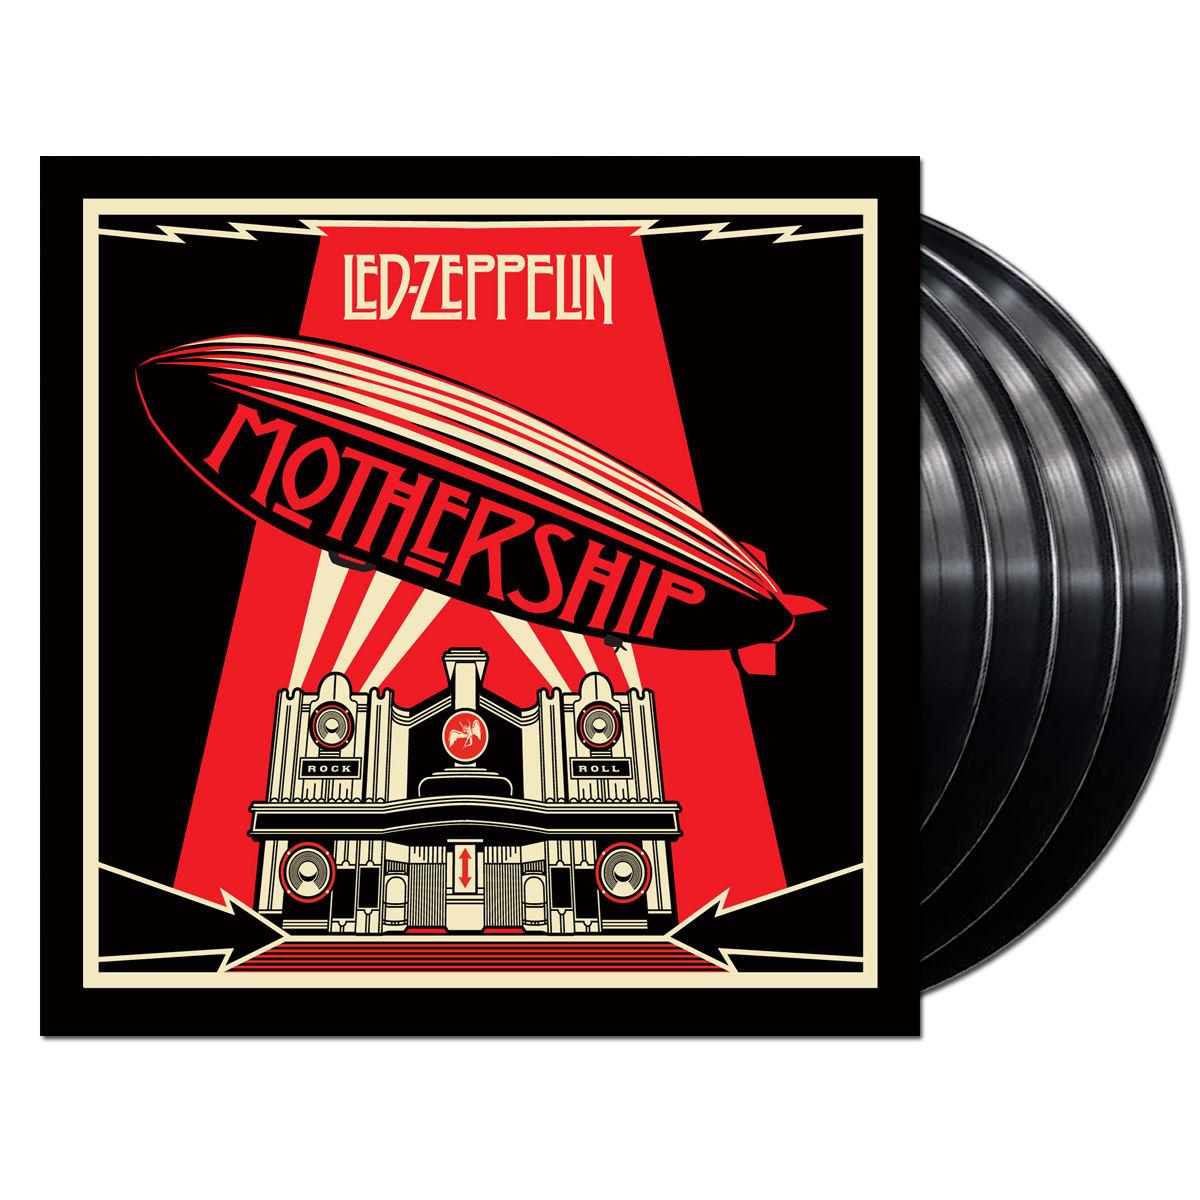 Shop | MusicVaultz